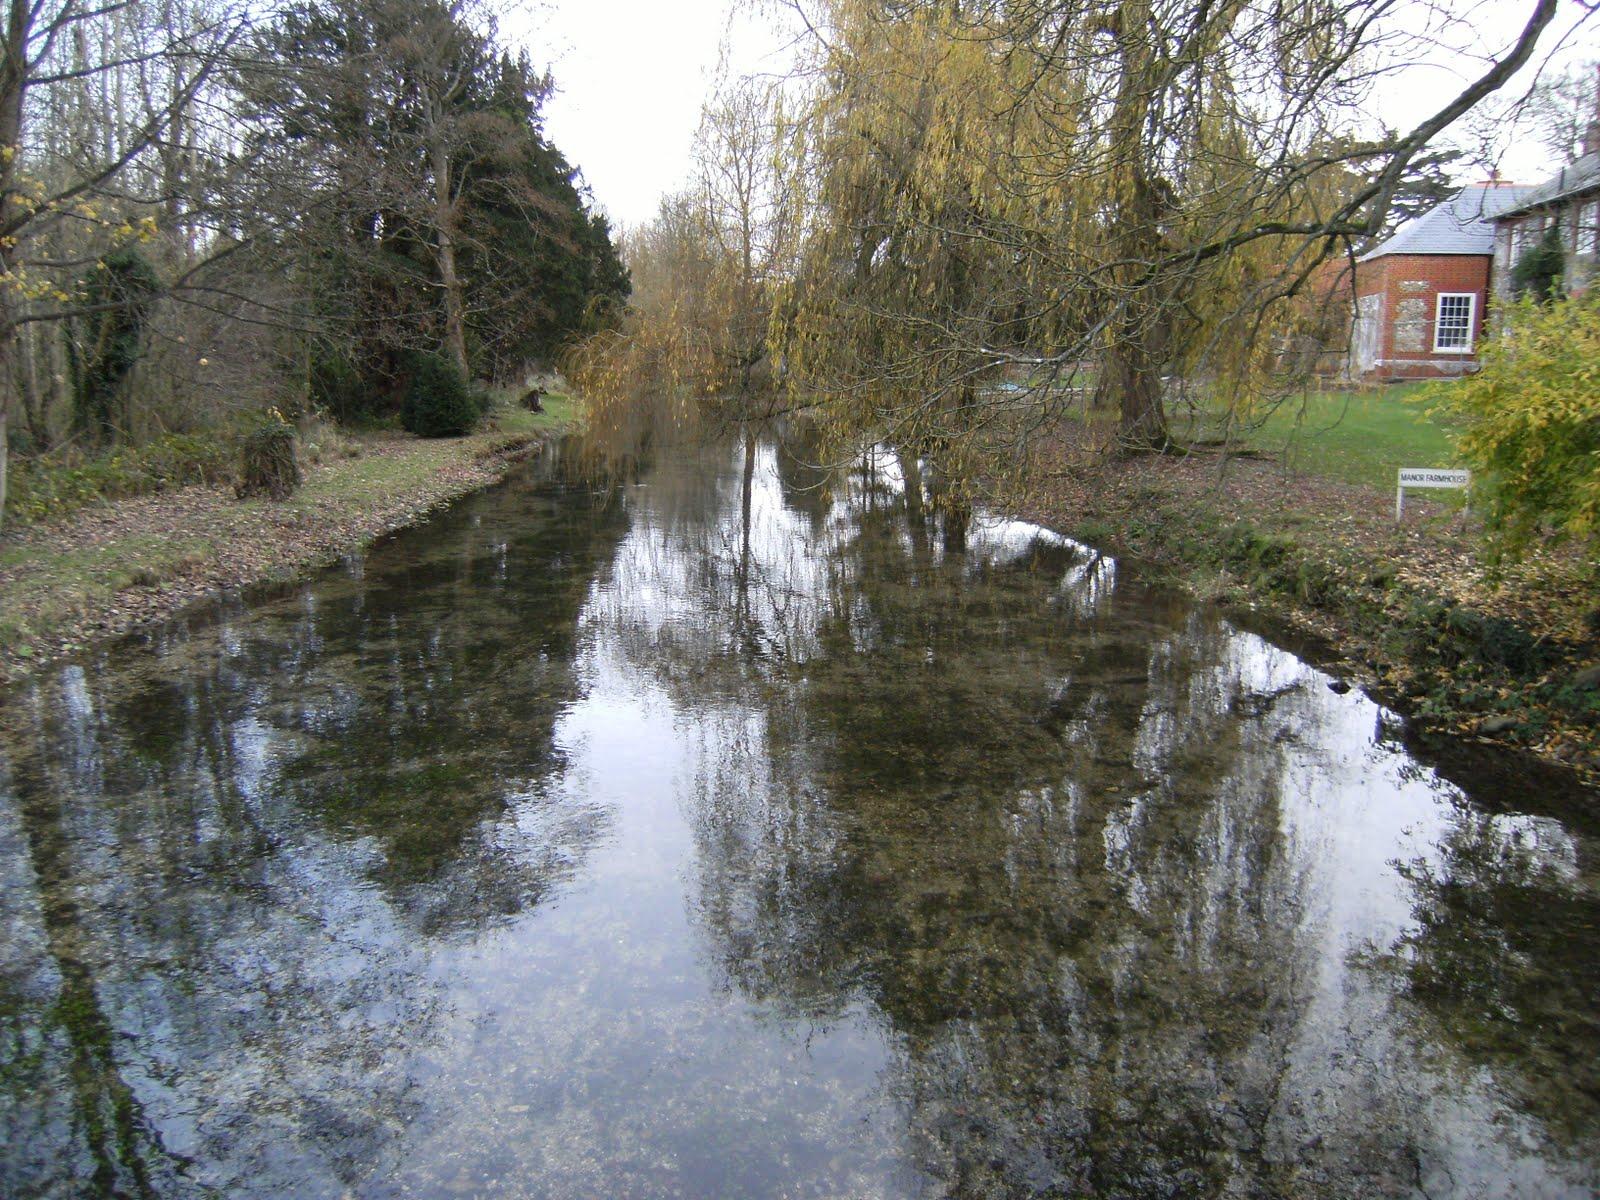 DSCF2710 River Test at Freefolk